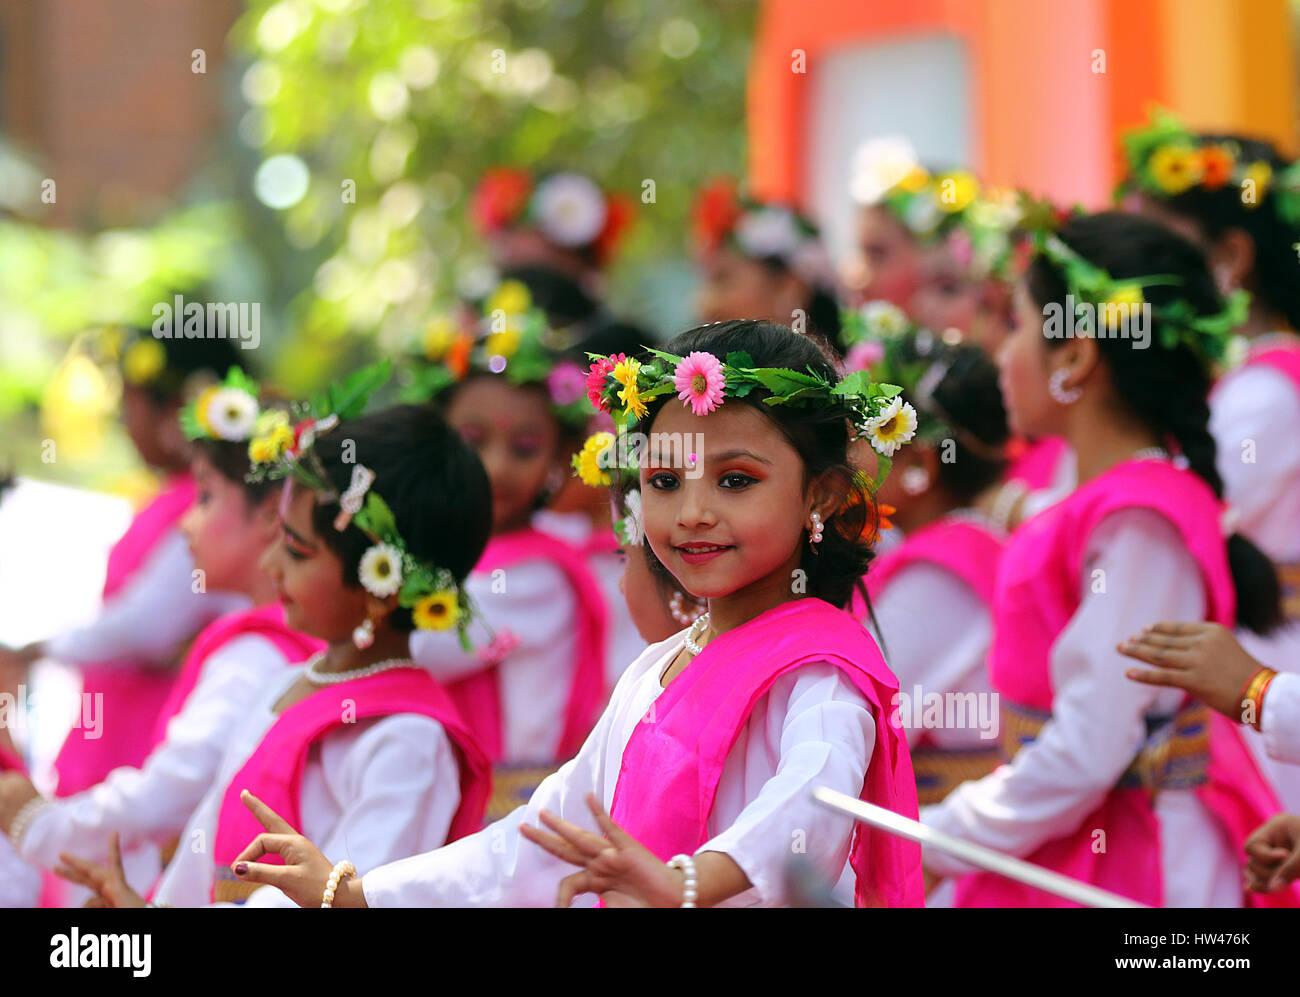 Dhaka, Bangladesh. Mar 16, 2017. Les enfants dansent dans un programme culturel, Bokul Tola de Dhaka University's Photo Stock